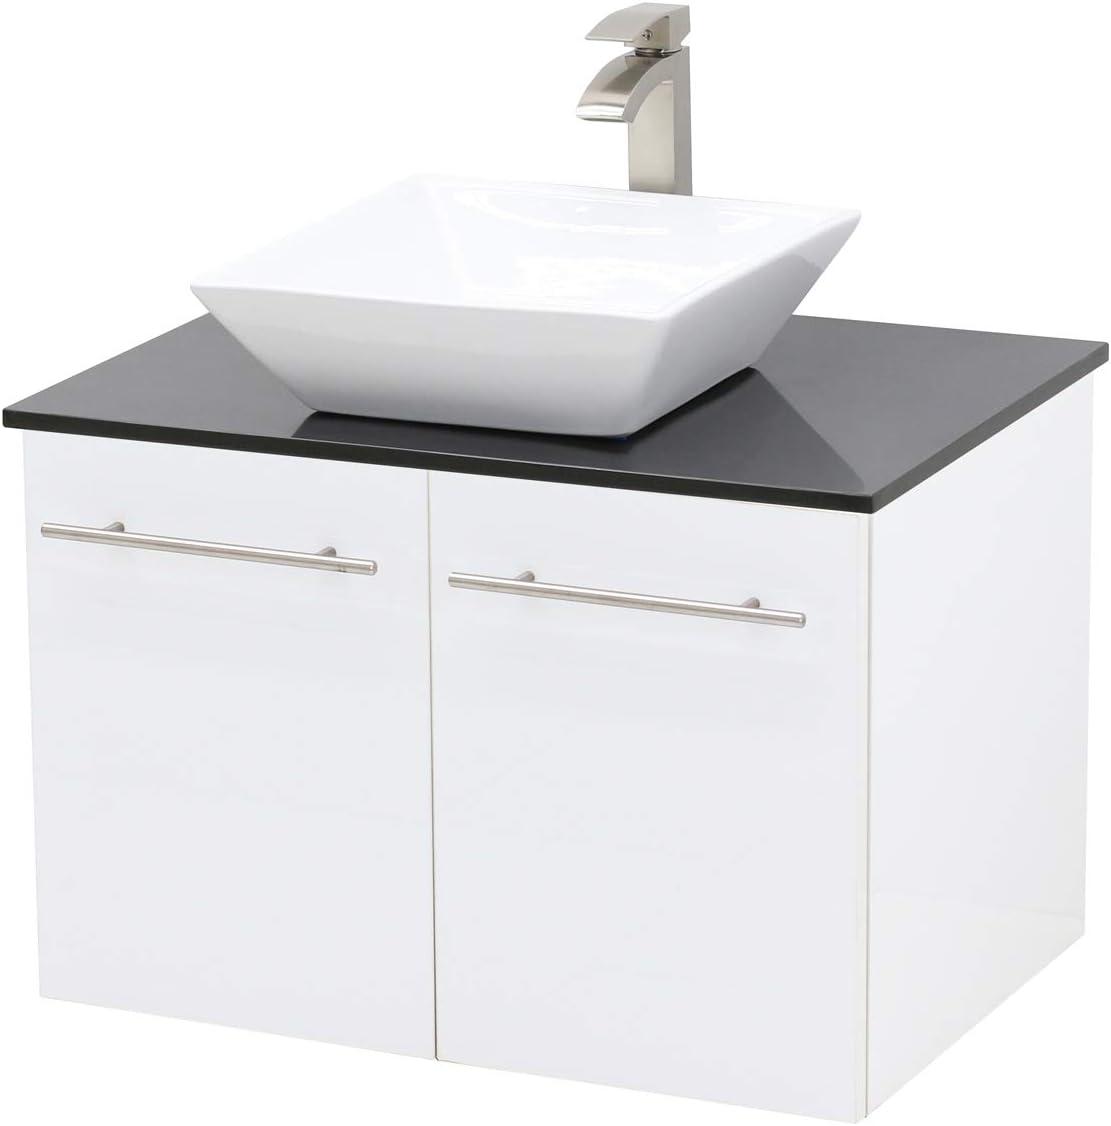 Windbay Wall Mount Floating Bathroom Vanity Sink Set White Embossed Texture Vanity Black Flat Stone Countertop Ceramic Sink 30 Amazon Com